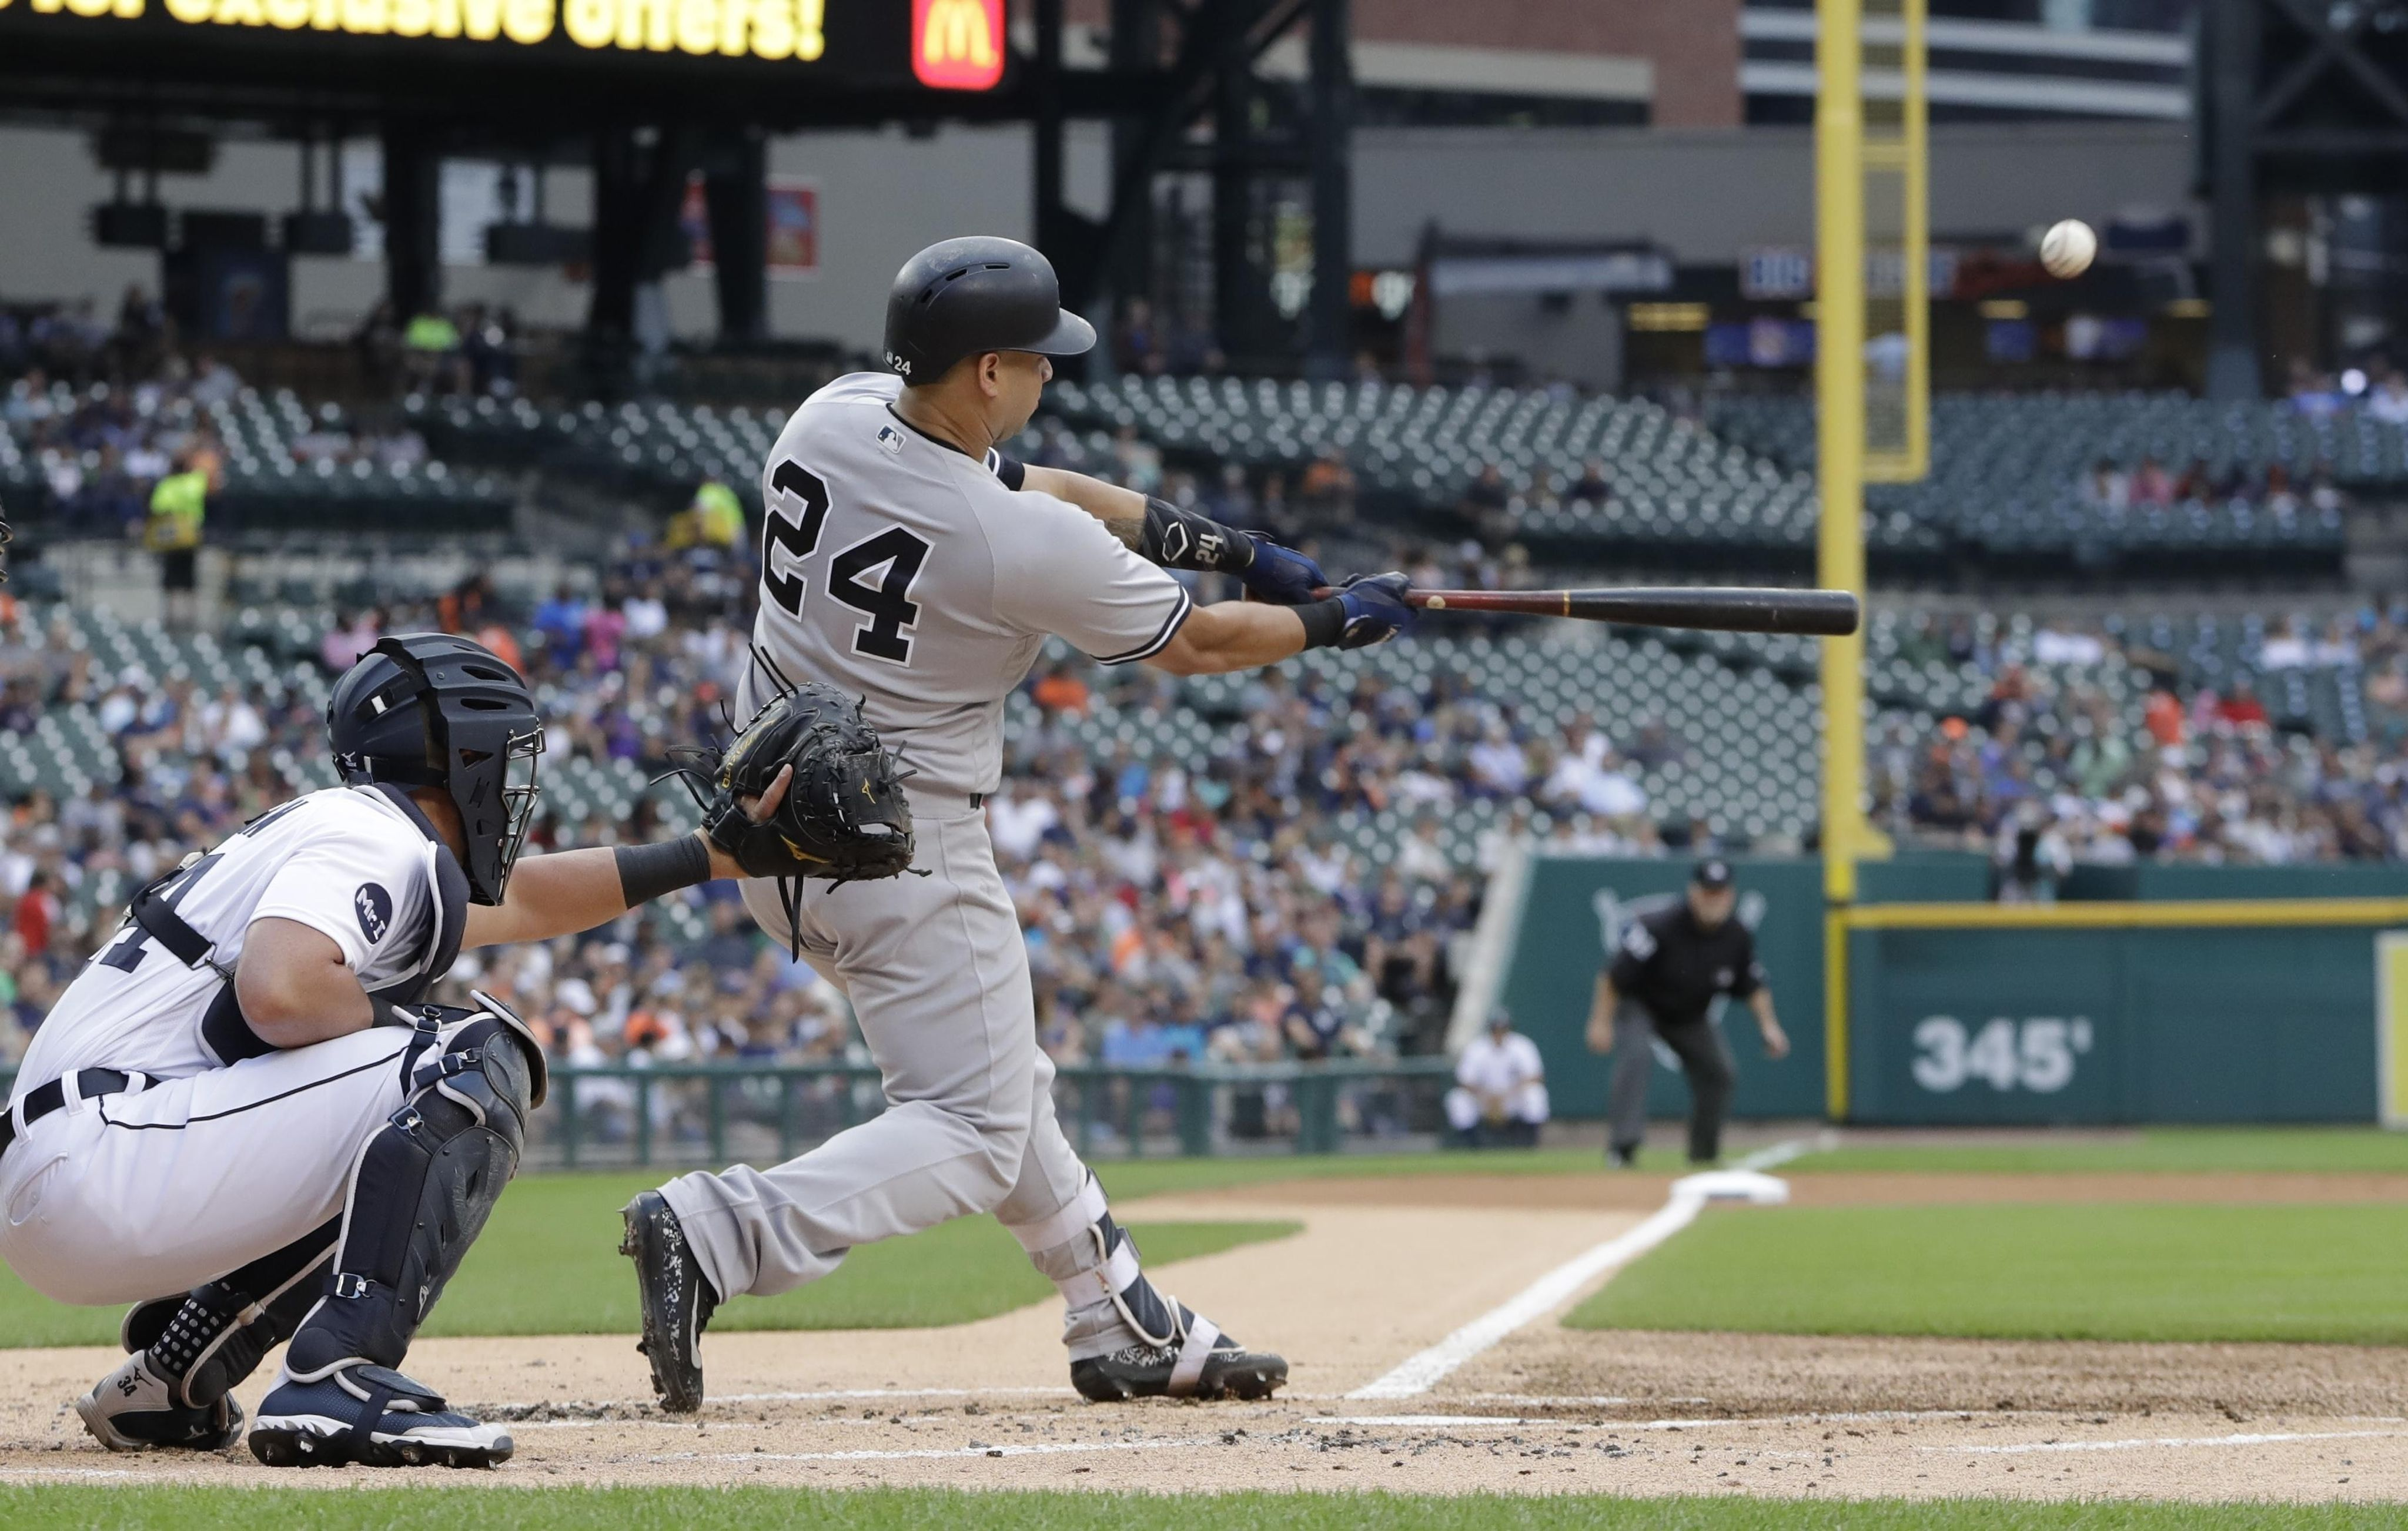 Yankees_tigers_baseball_72146_s4096x2605